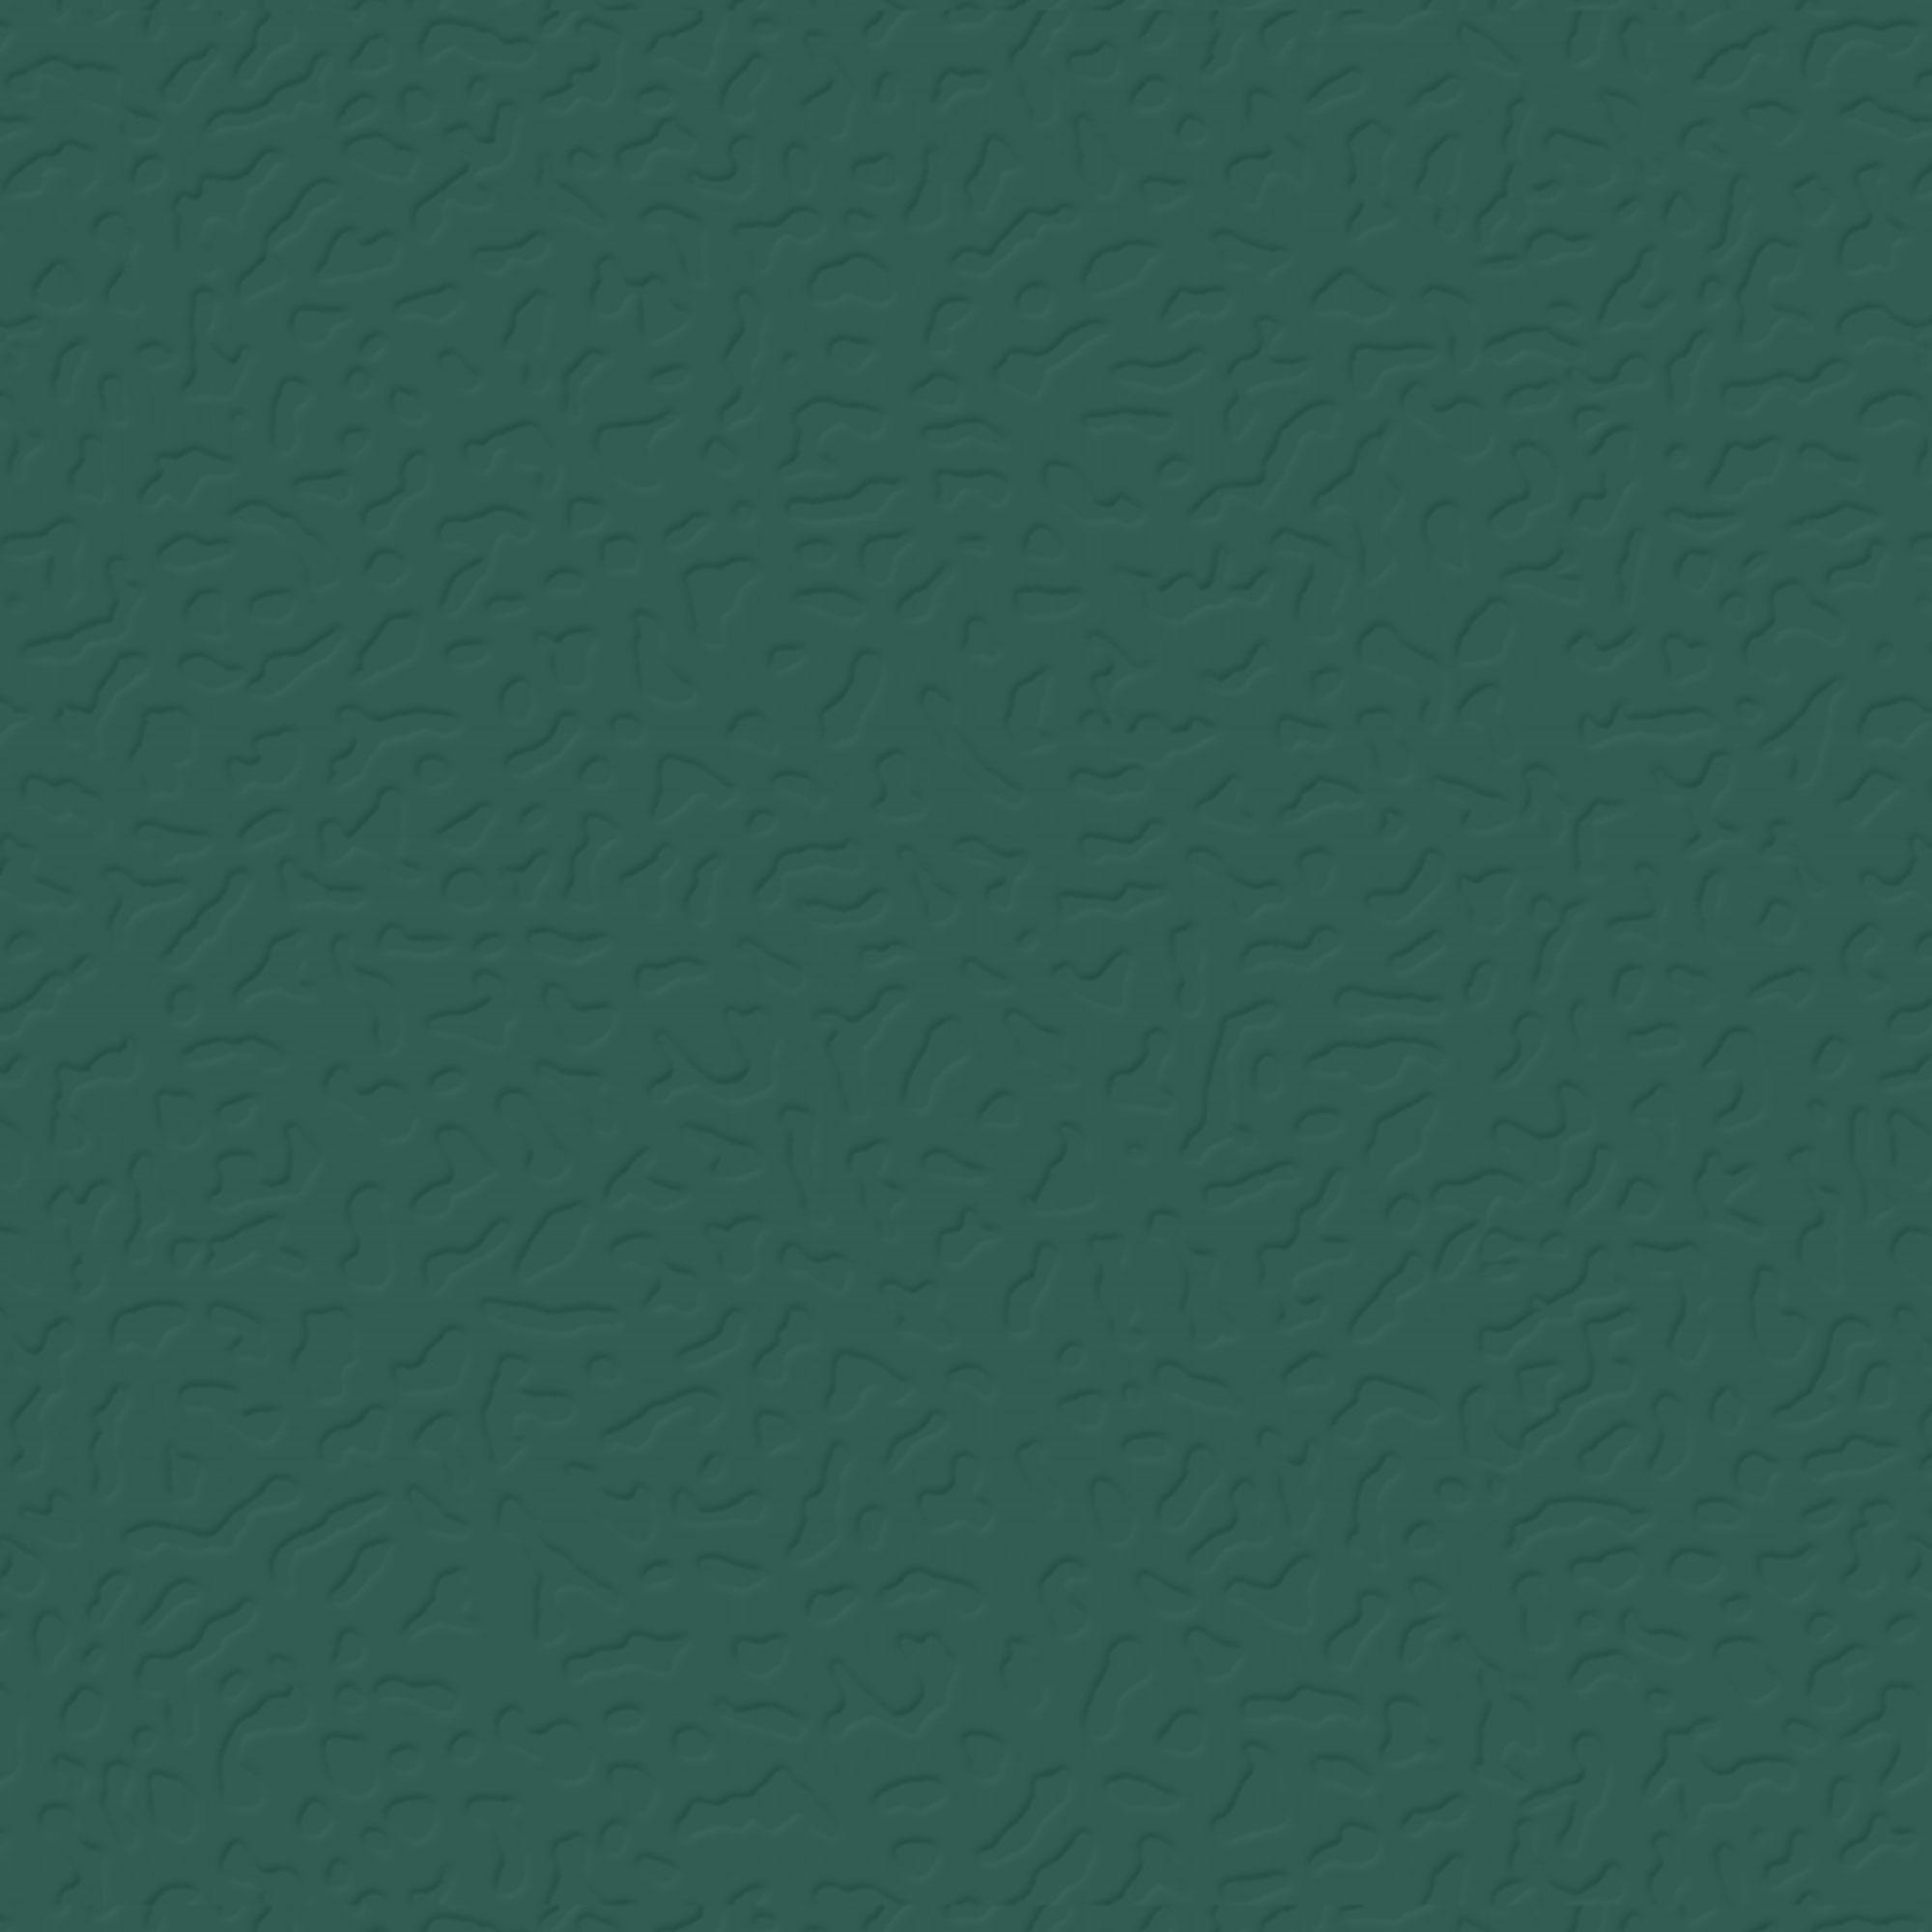 Roppe Rubber Tile 900 - Hammered Design (995) Forest Green Rubber Flooring